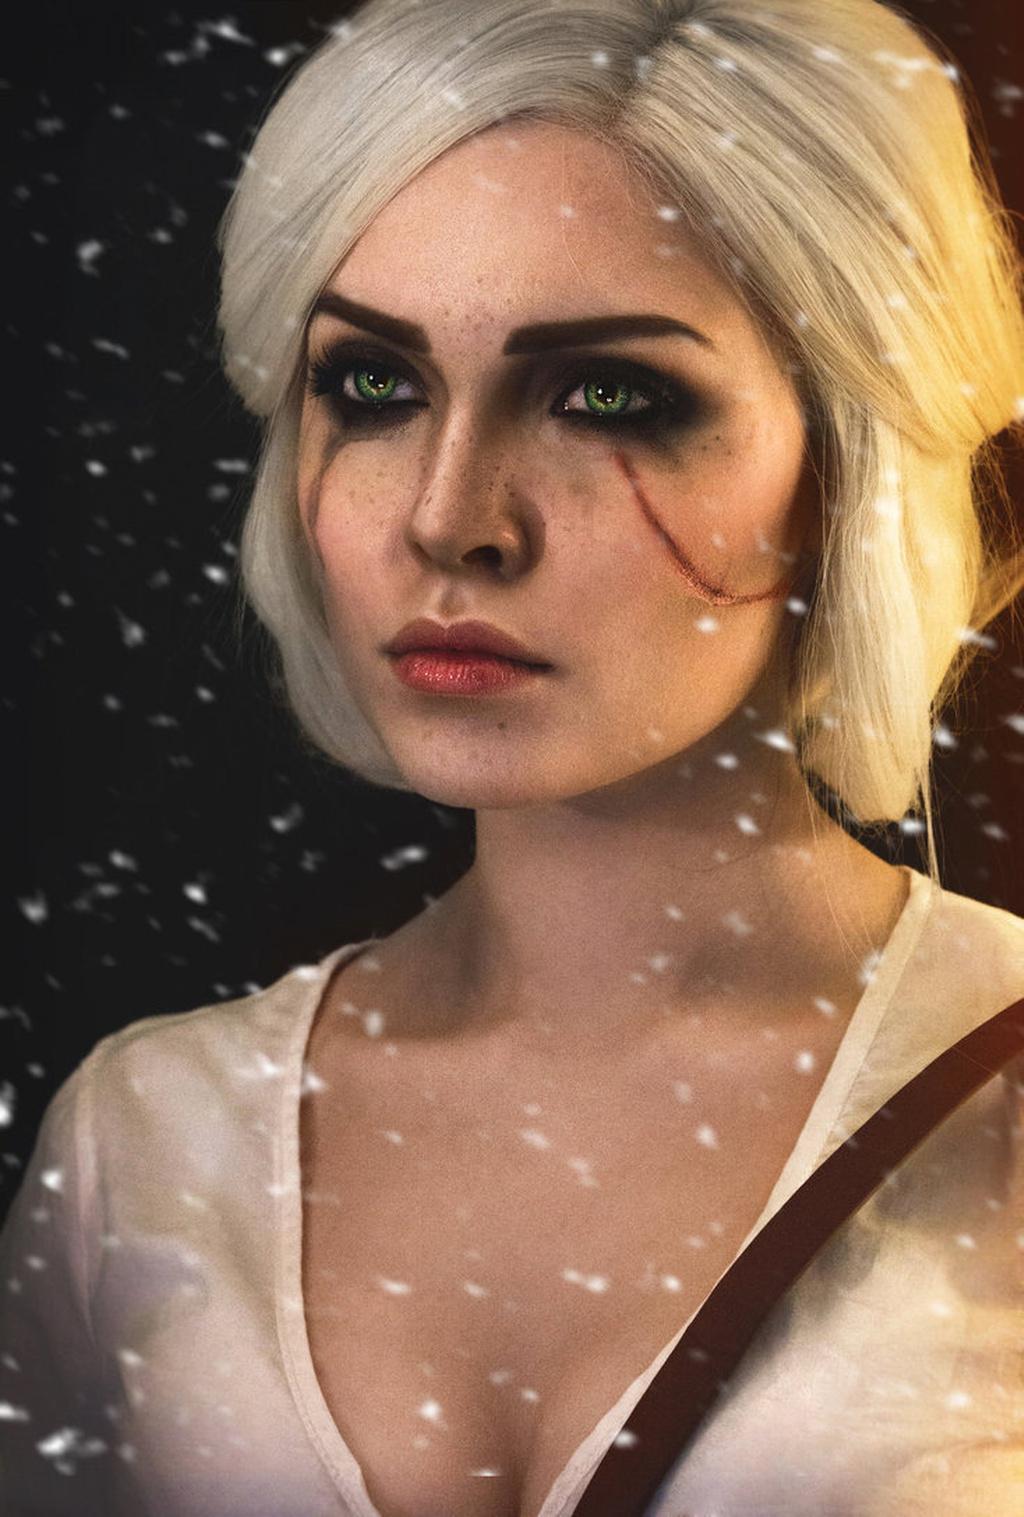 Ciri Art.jpg - Witcher 3: Wild Hunt, the